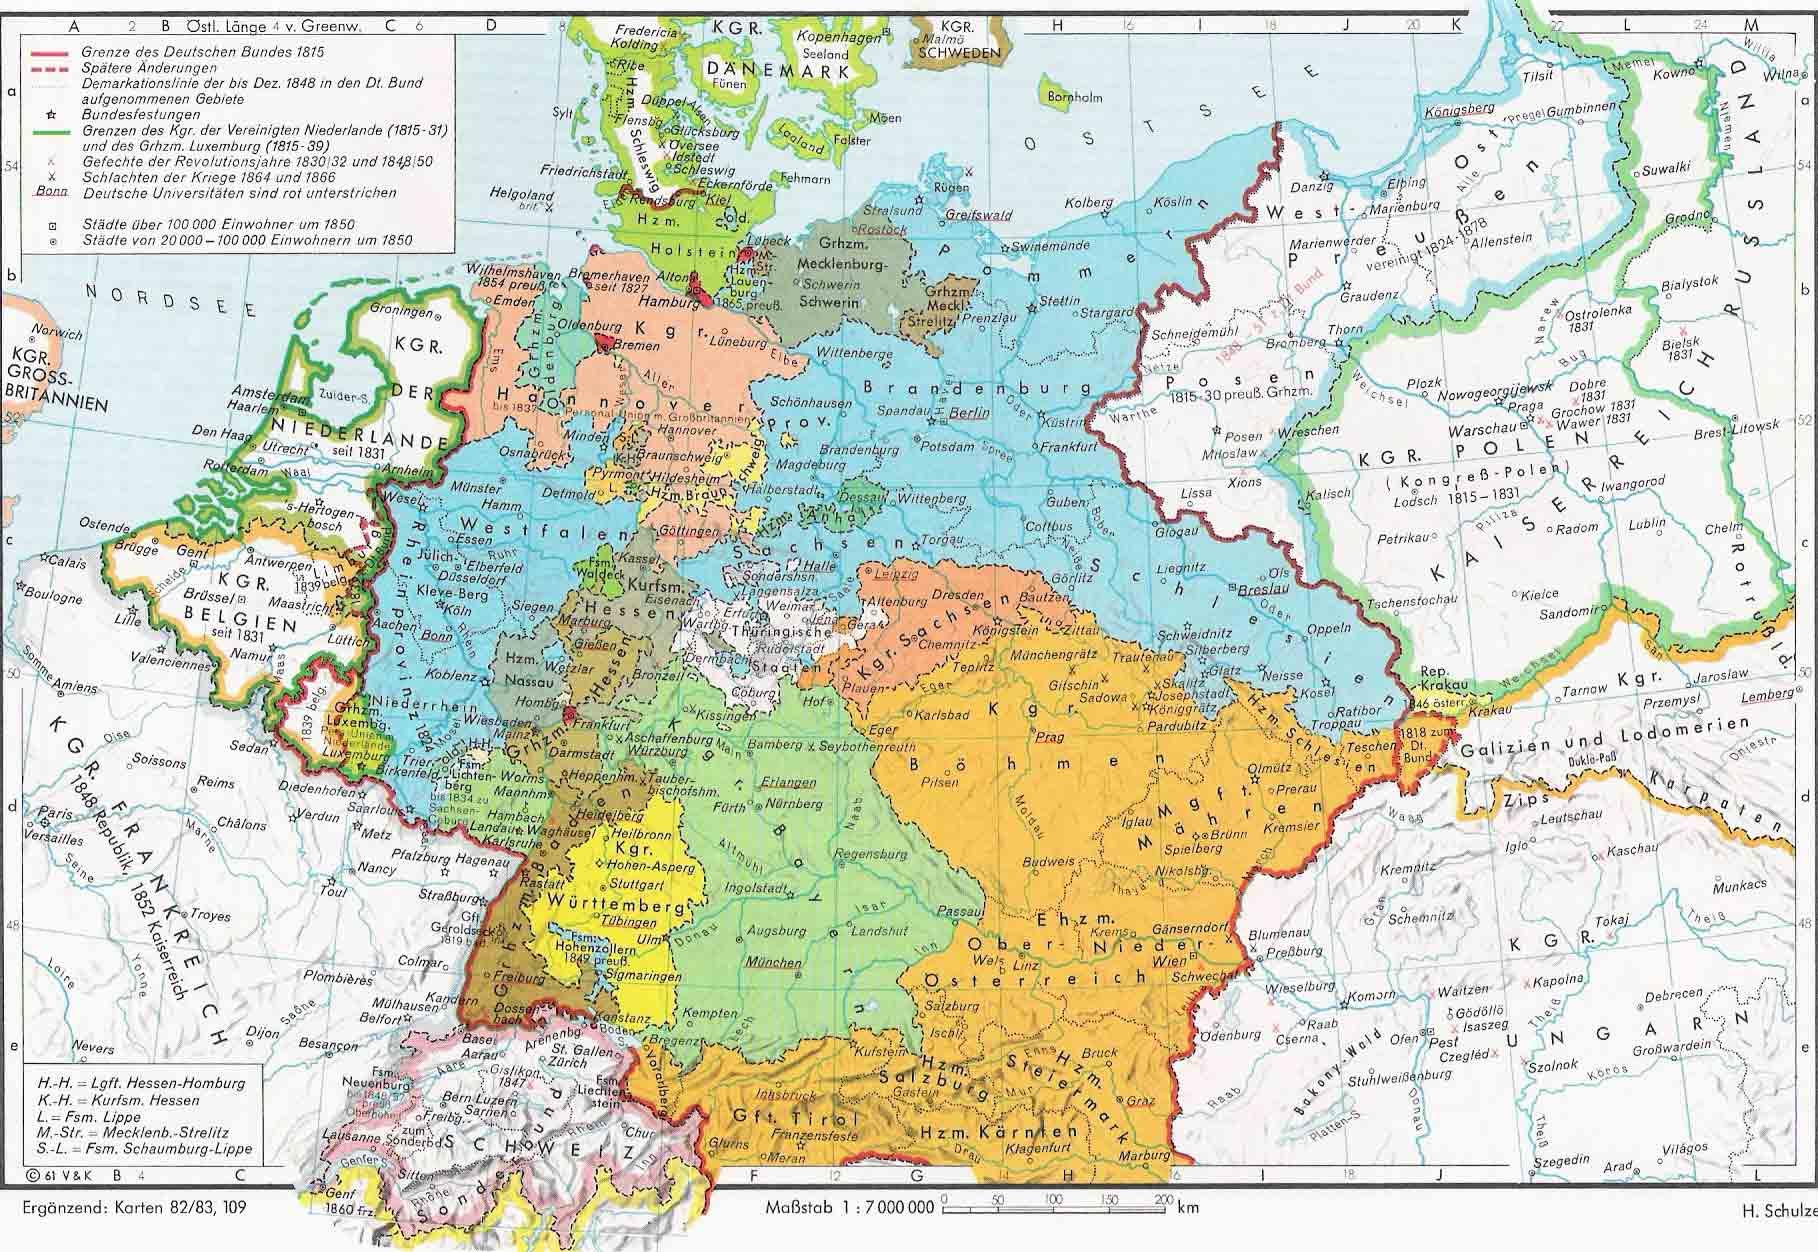 Europe 1815 1866 Full size